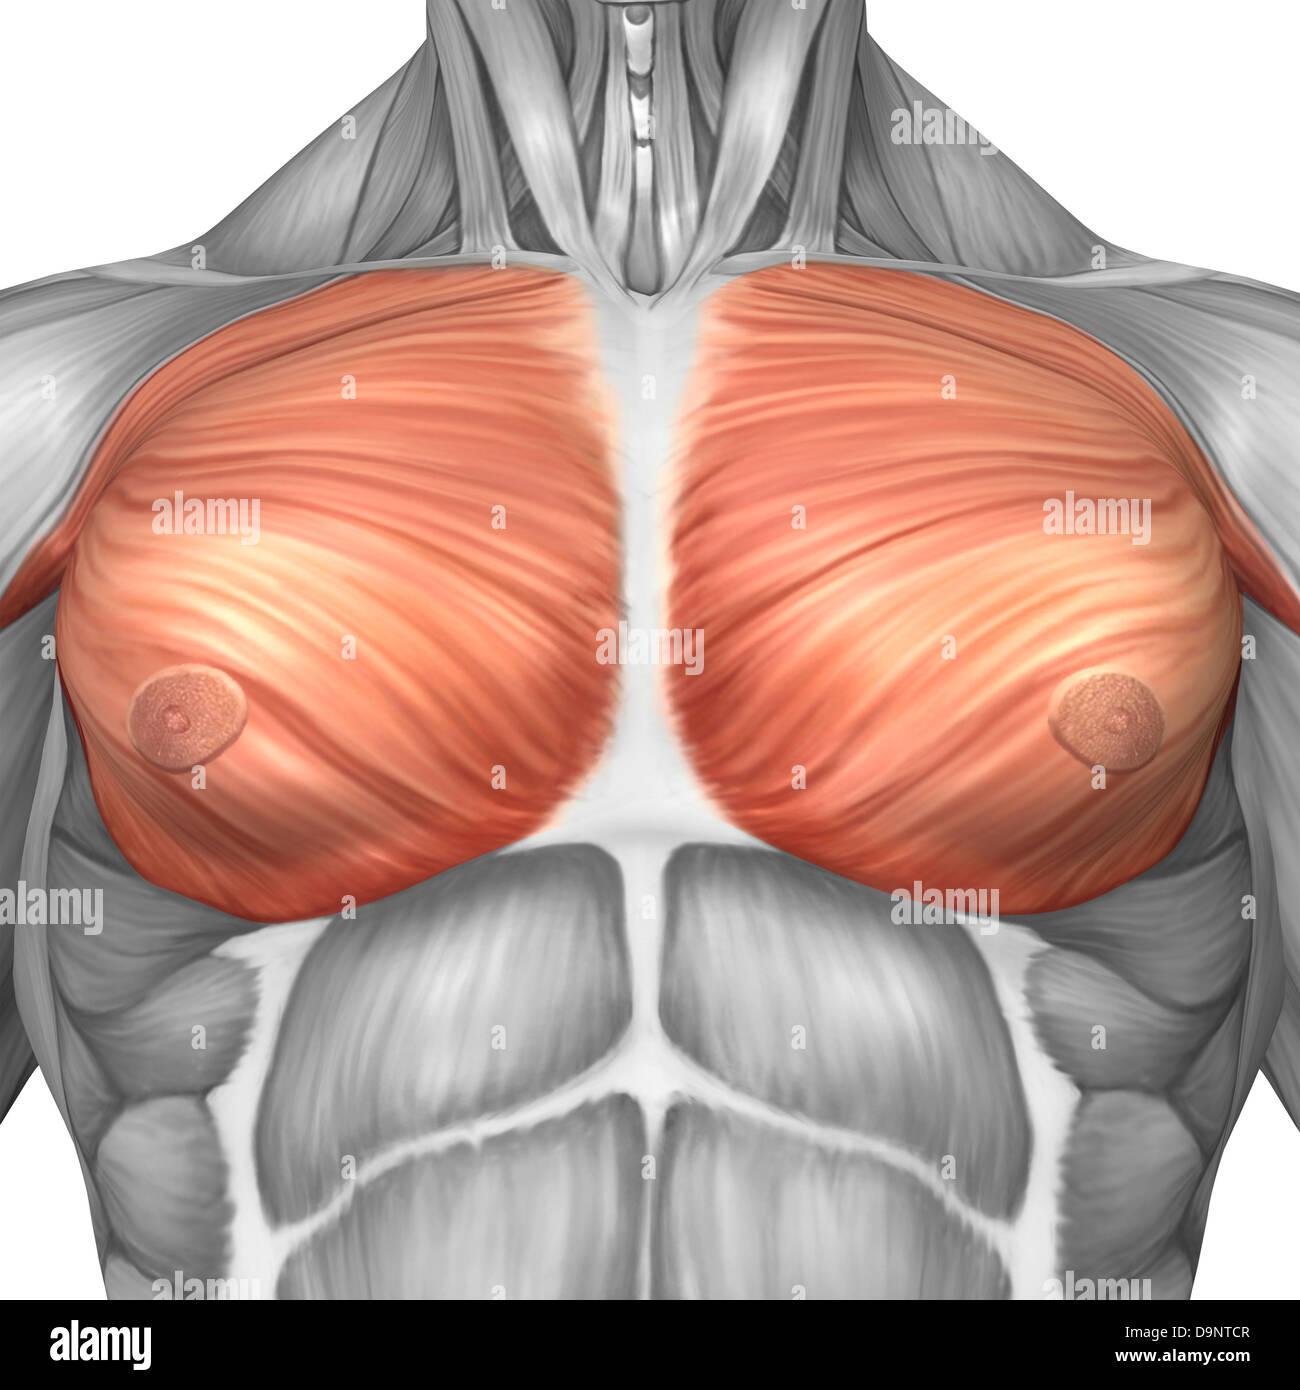 Male Abdomen Anatomy Stock Photos Male Abdomen Anatomy Stock